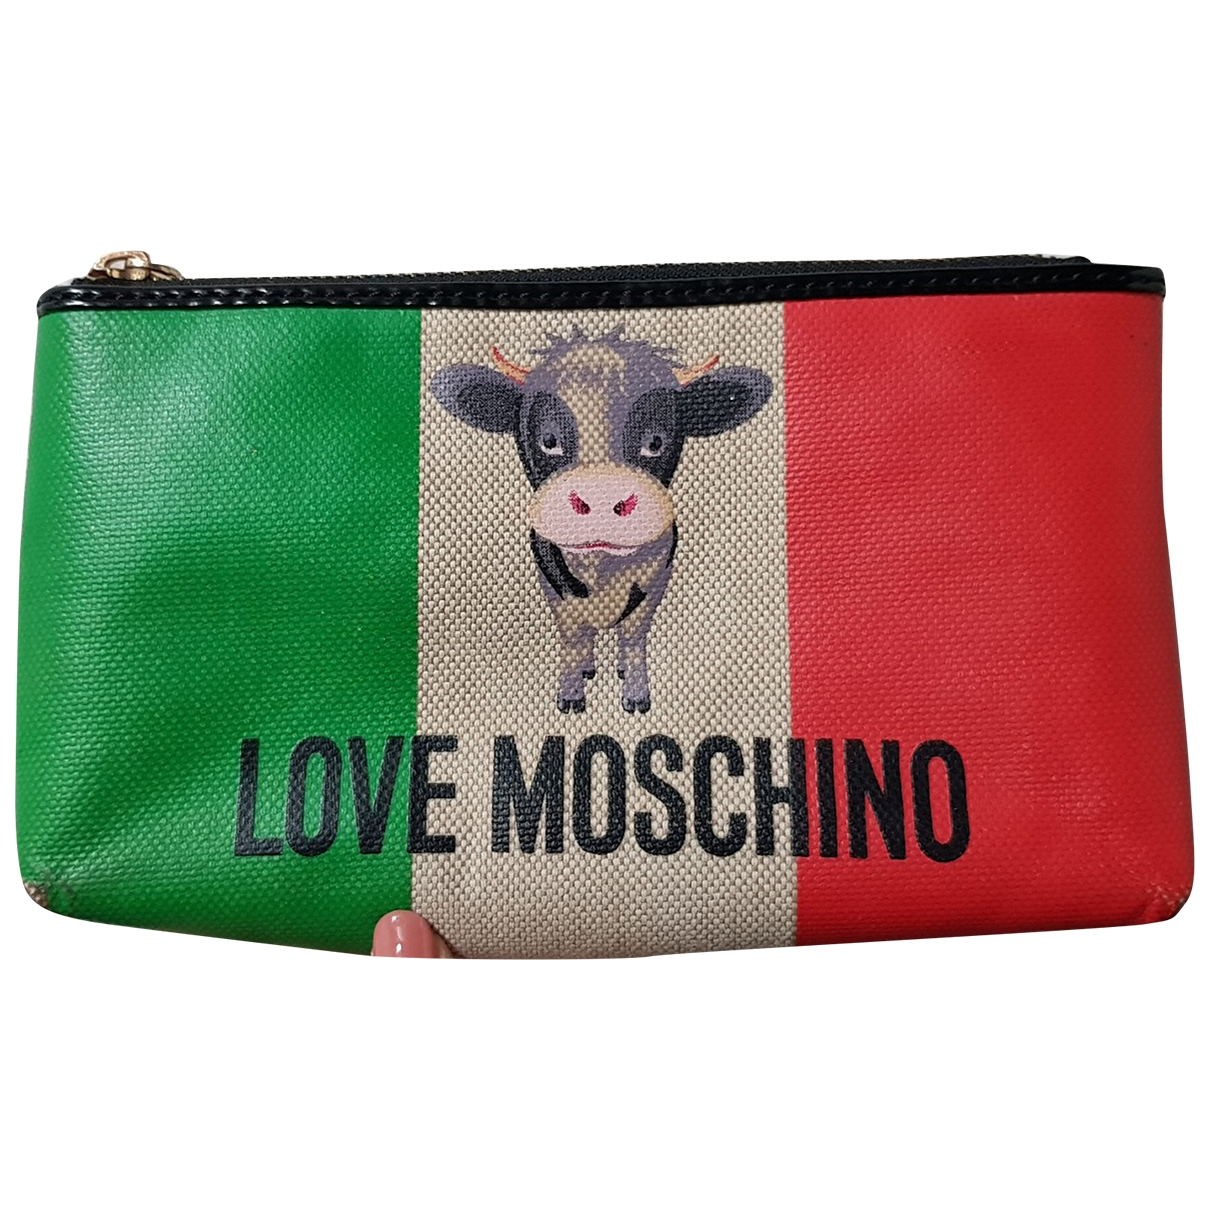 Moschino Love - Petite maroquinerie   pour femme en toile - multicolore